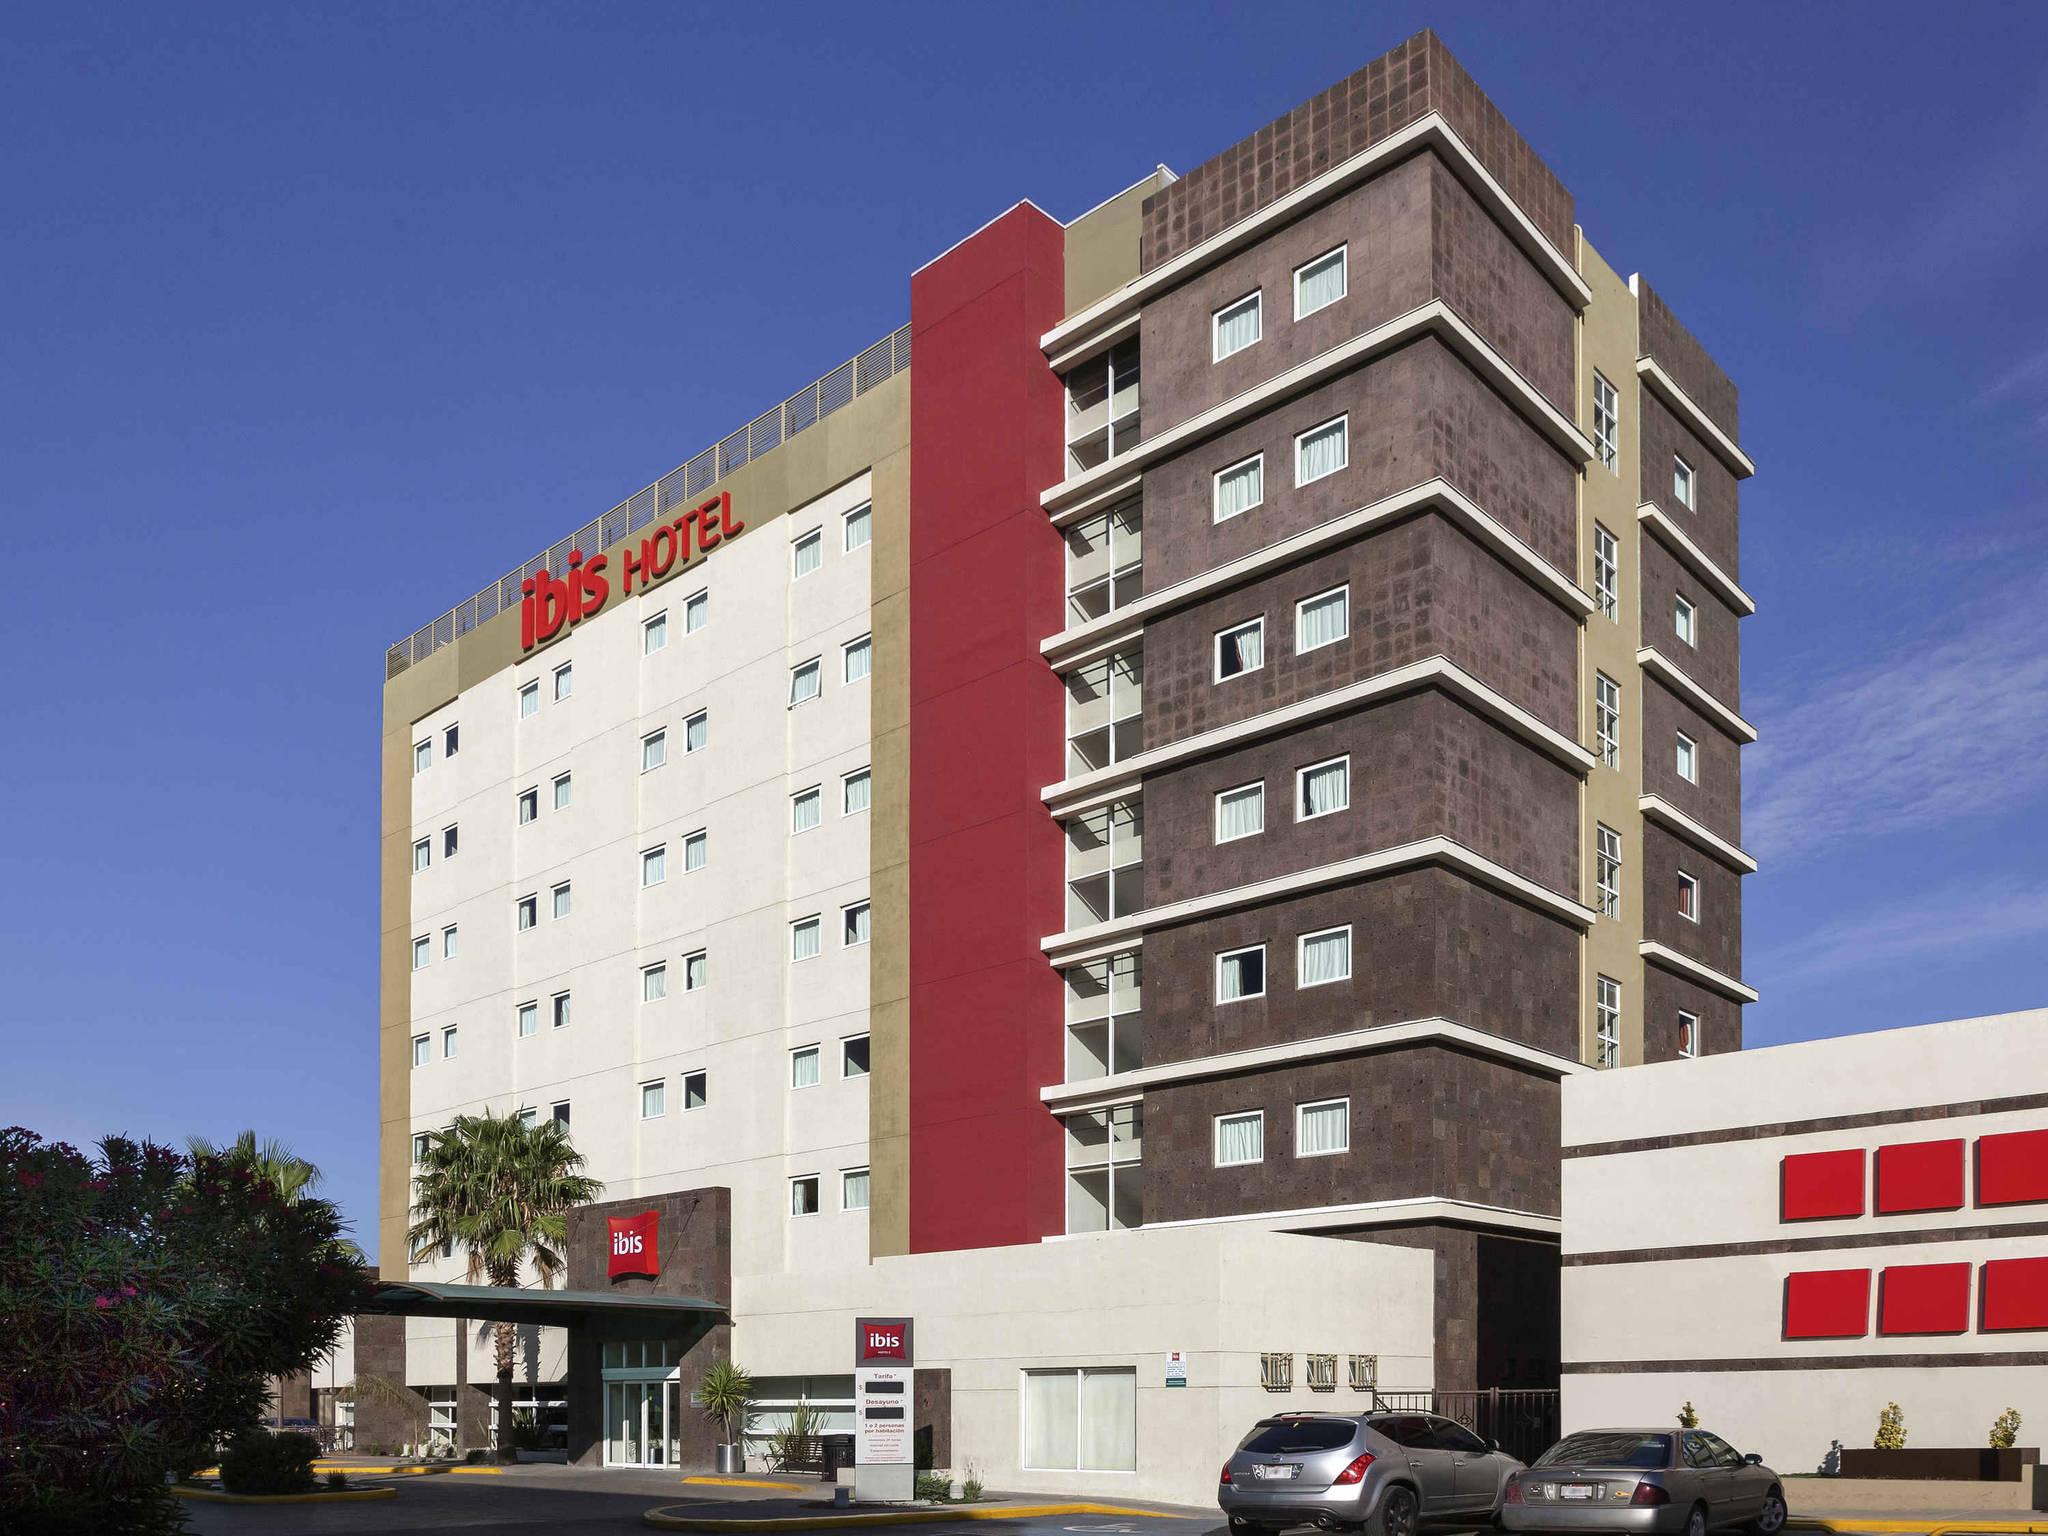 Hotel Ibis Chihuahua